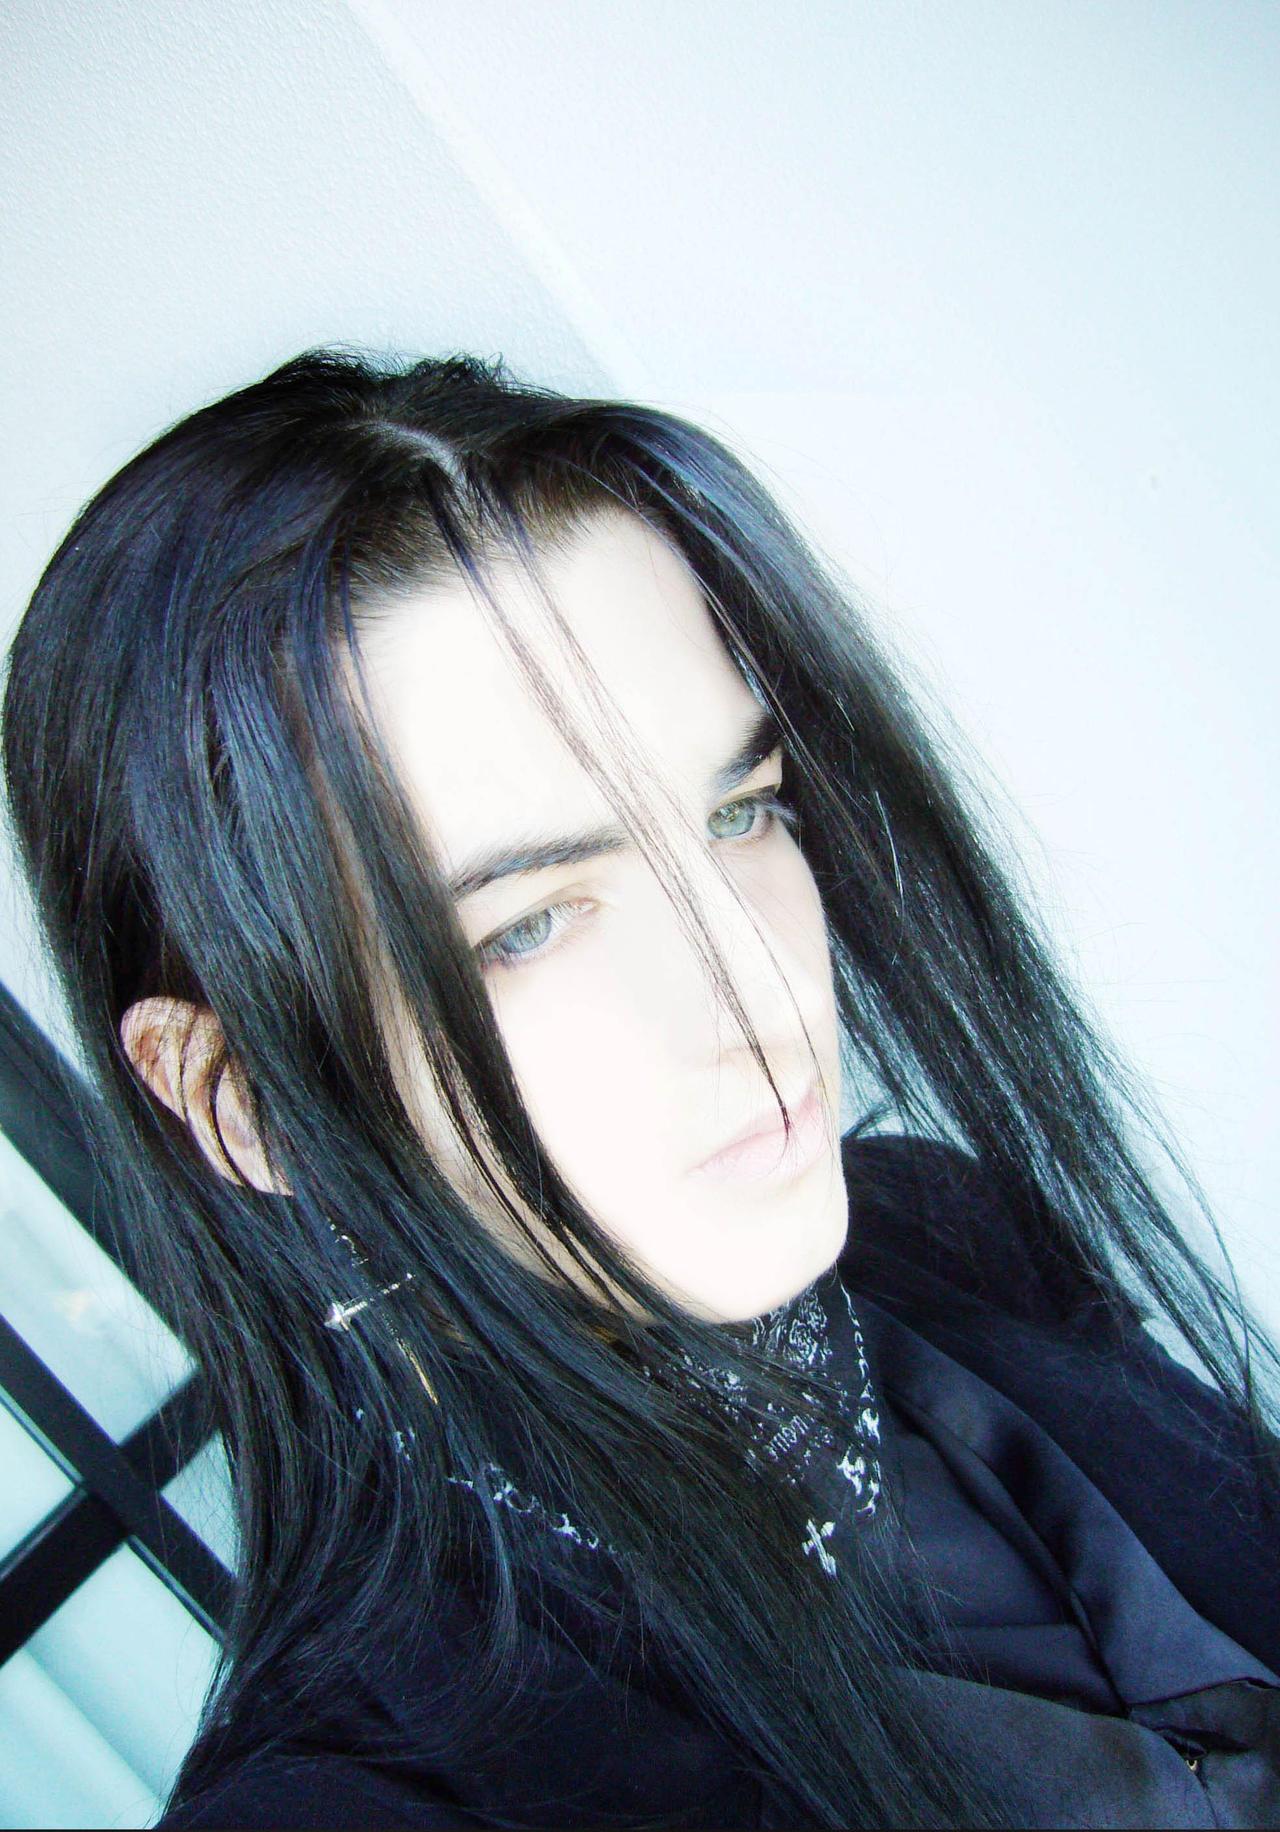 nemurutenshi-yue's Profile Picture